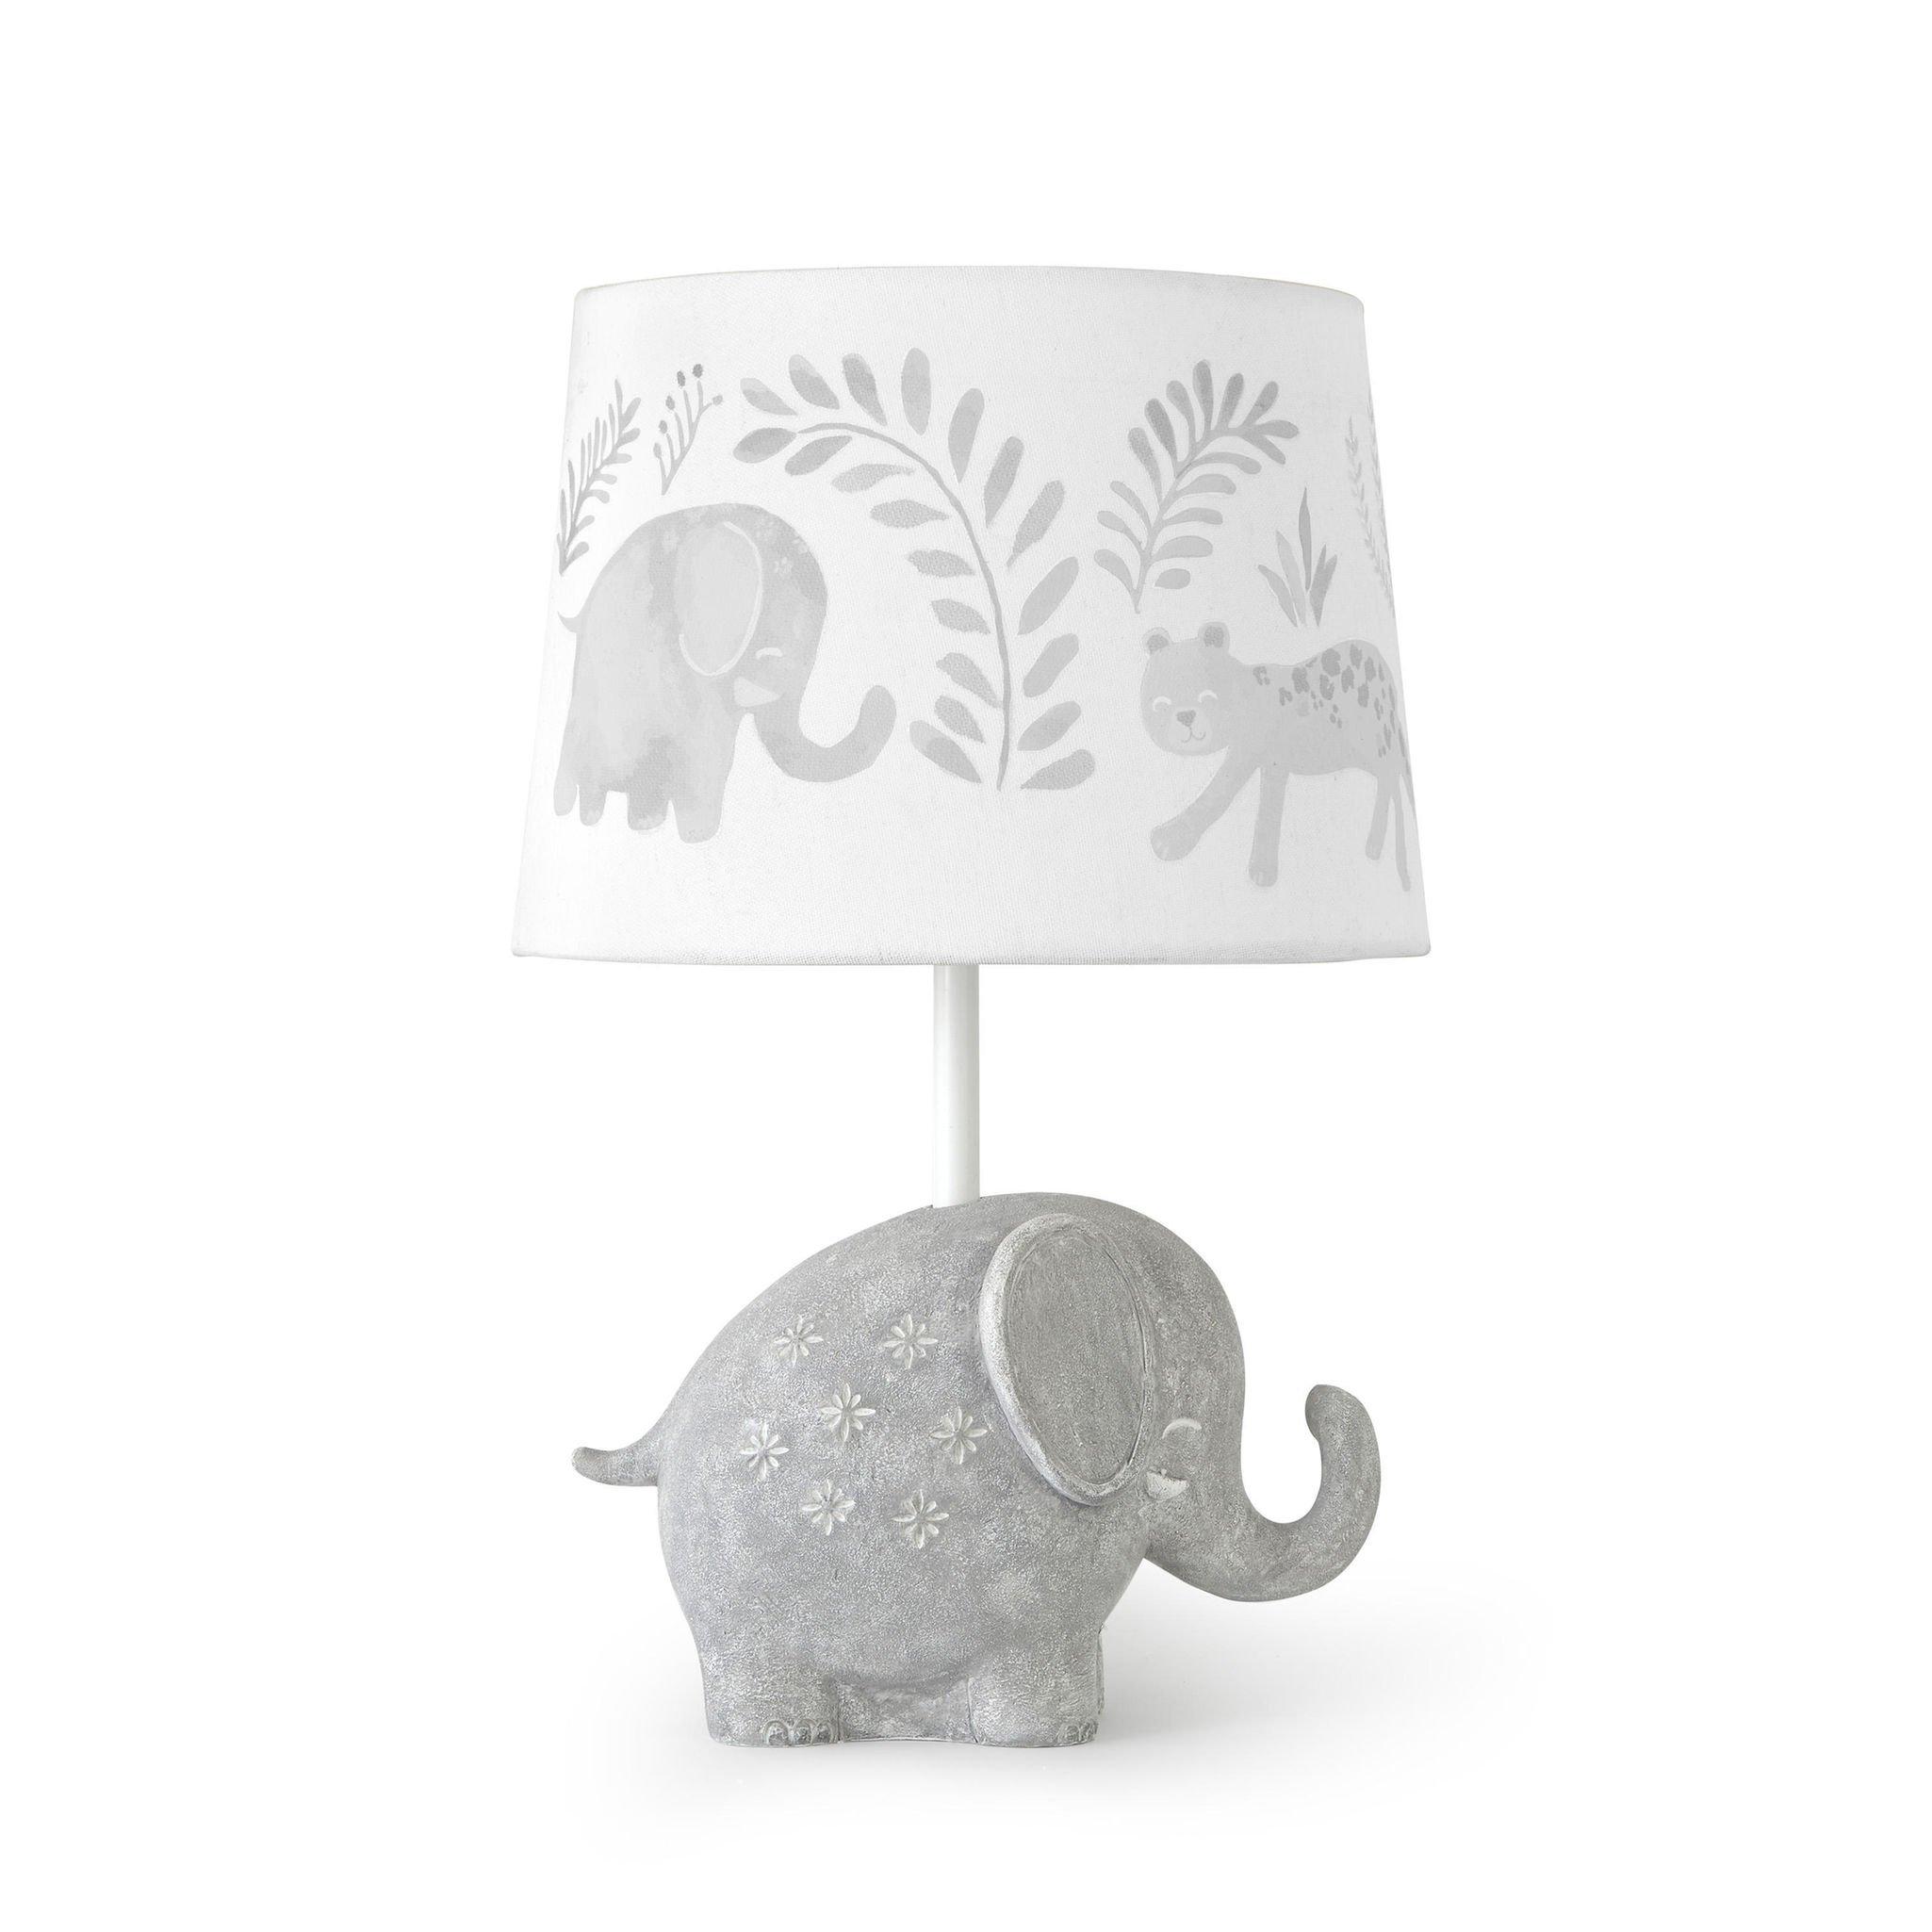 Levtex Baby Jungalo Grey Elephant Lamp Base and Shade